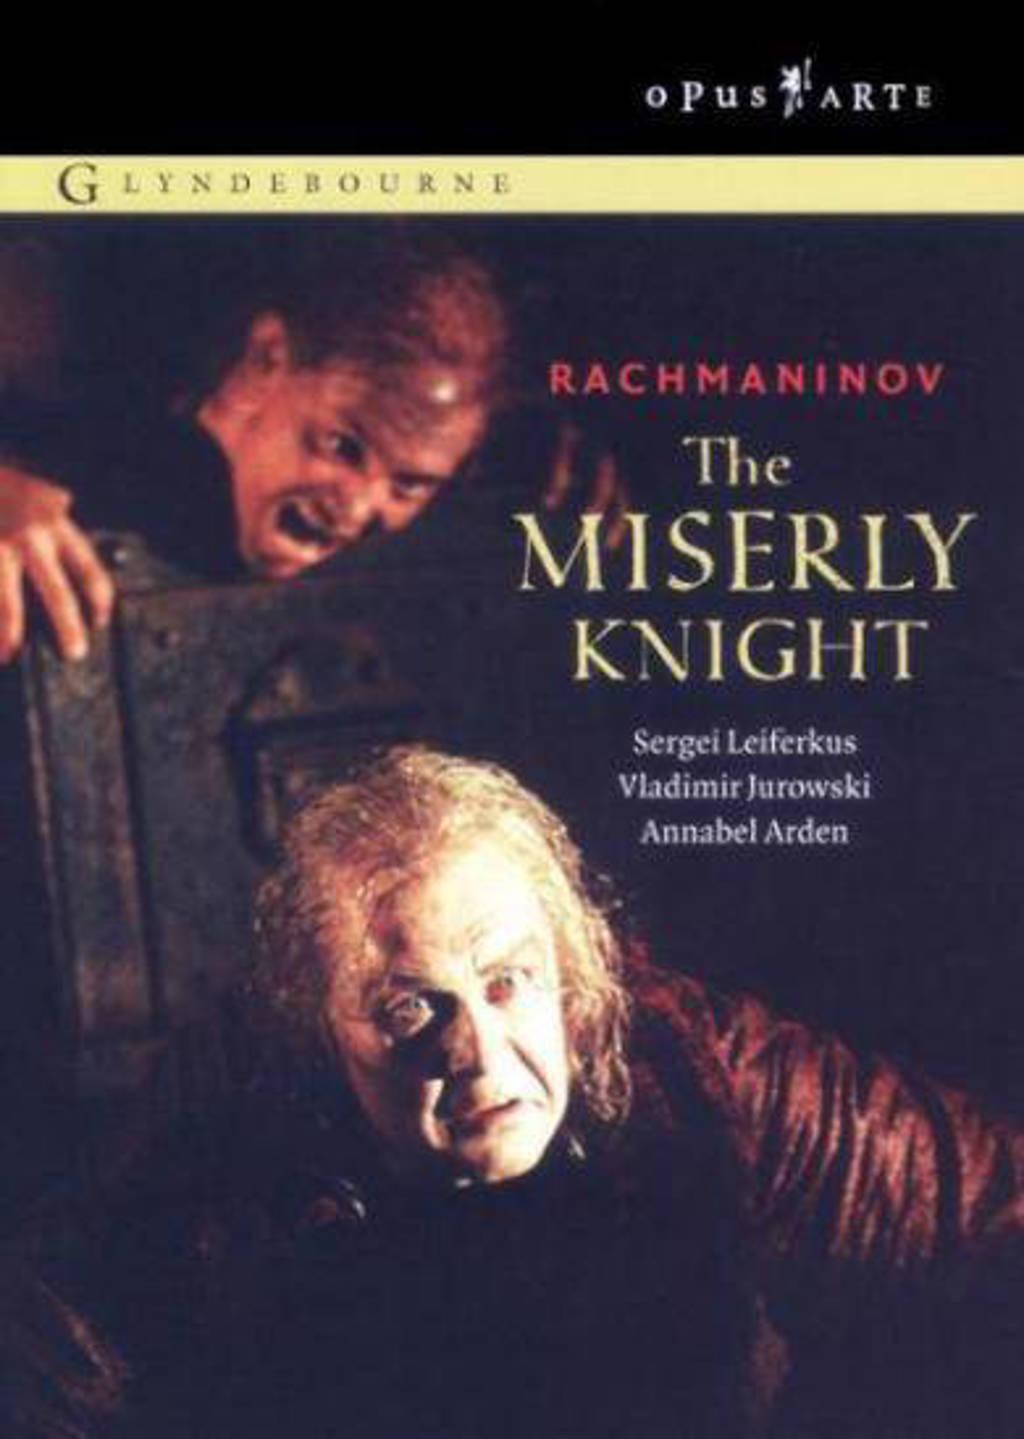 Leiferkus/Berkeley-Steele/London Ph - The Miserly Knight (DVD)